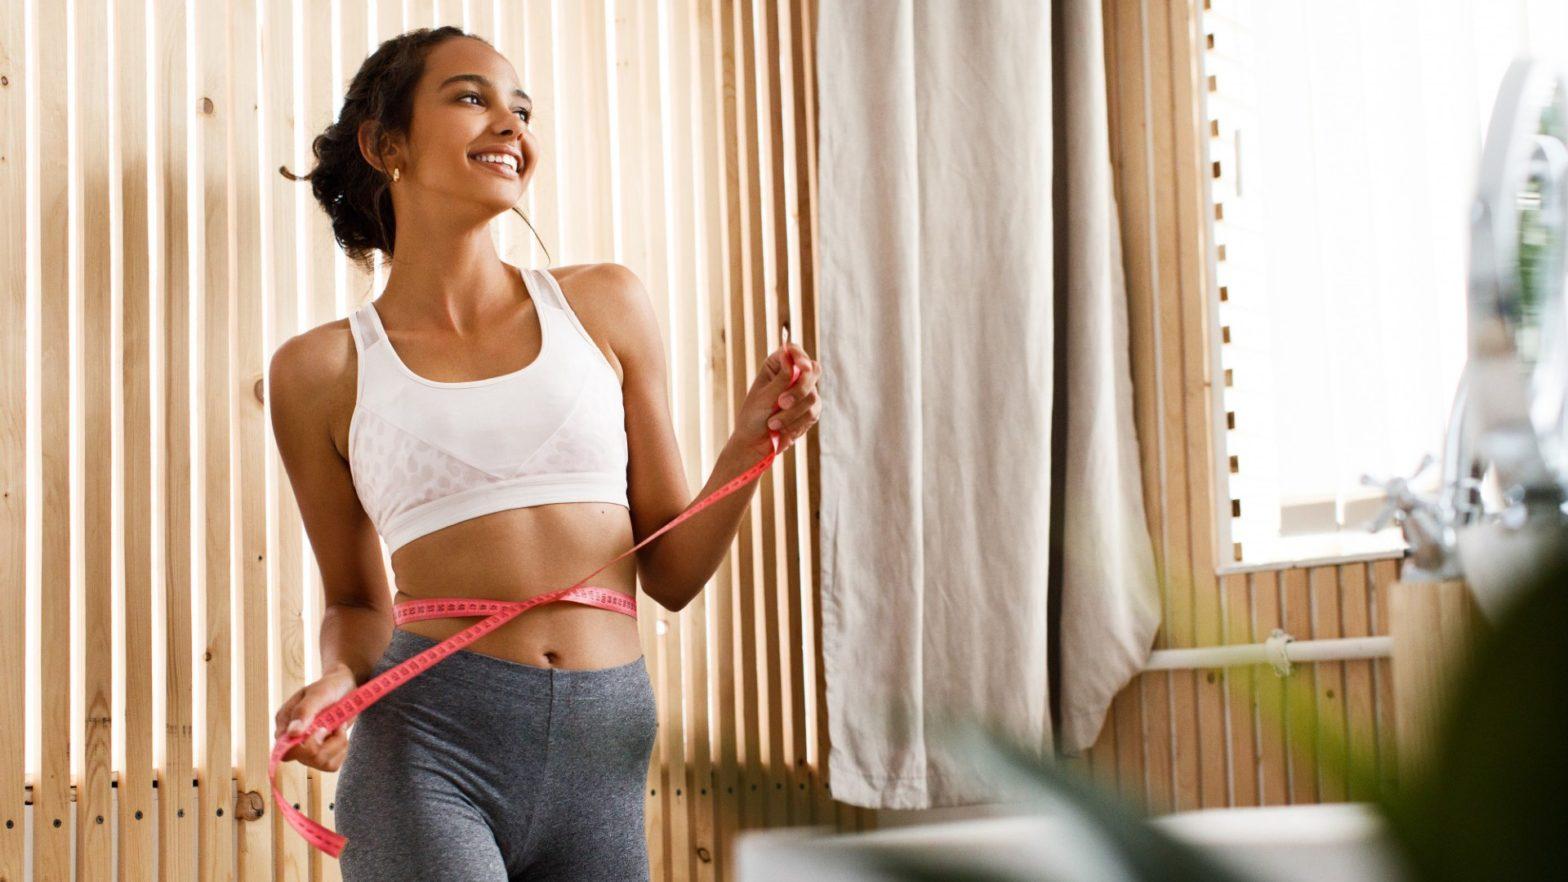 como perder peso de forma natural após a gravidez.